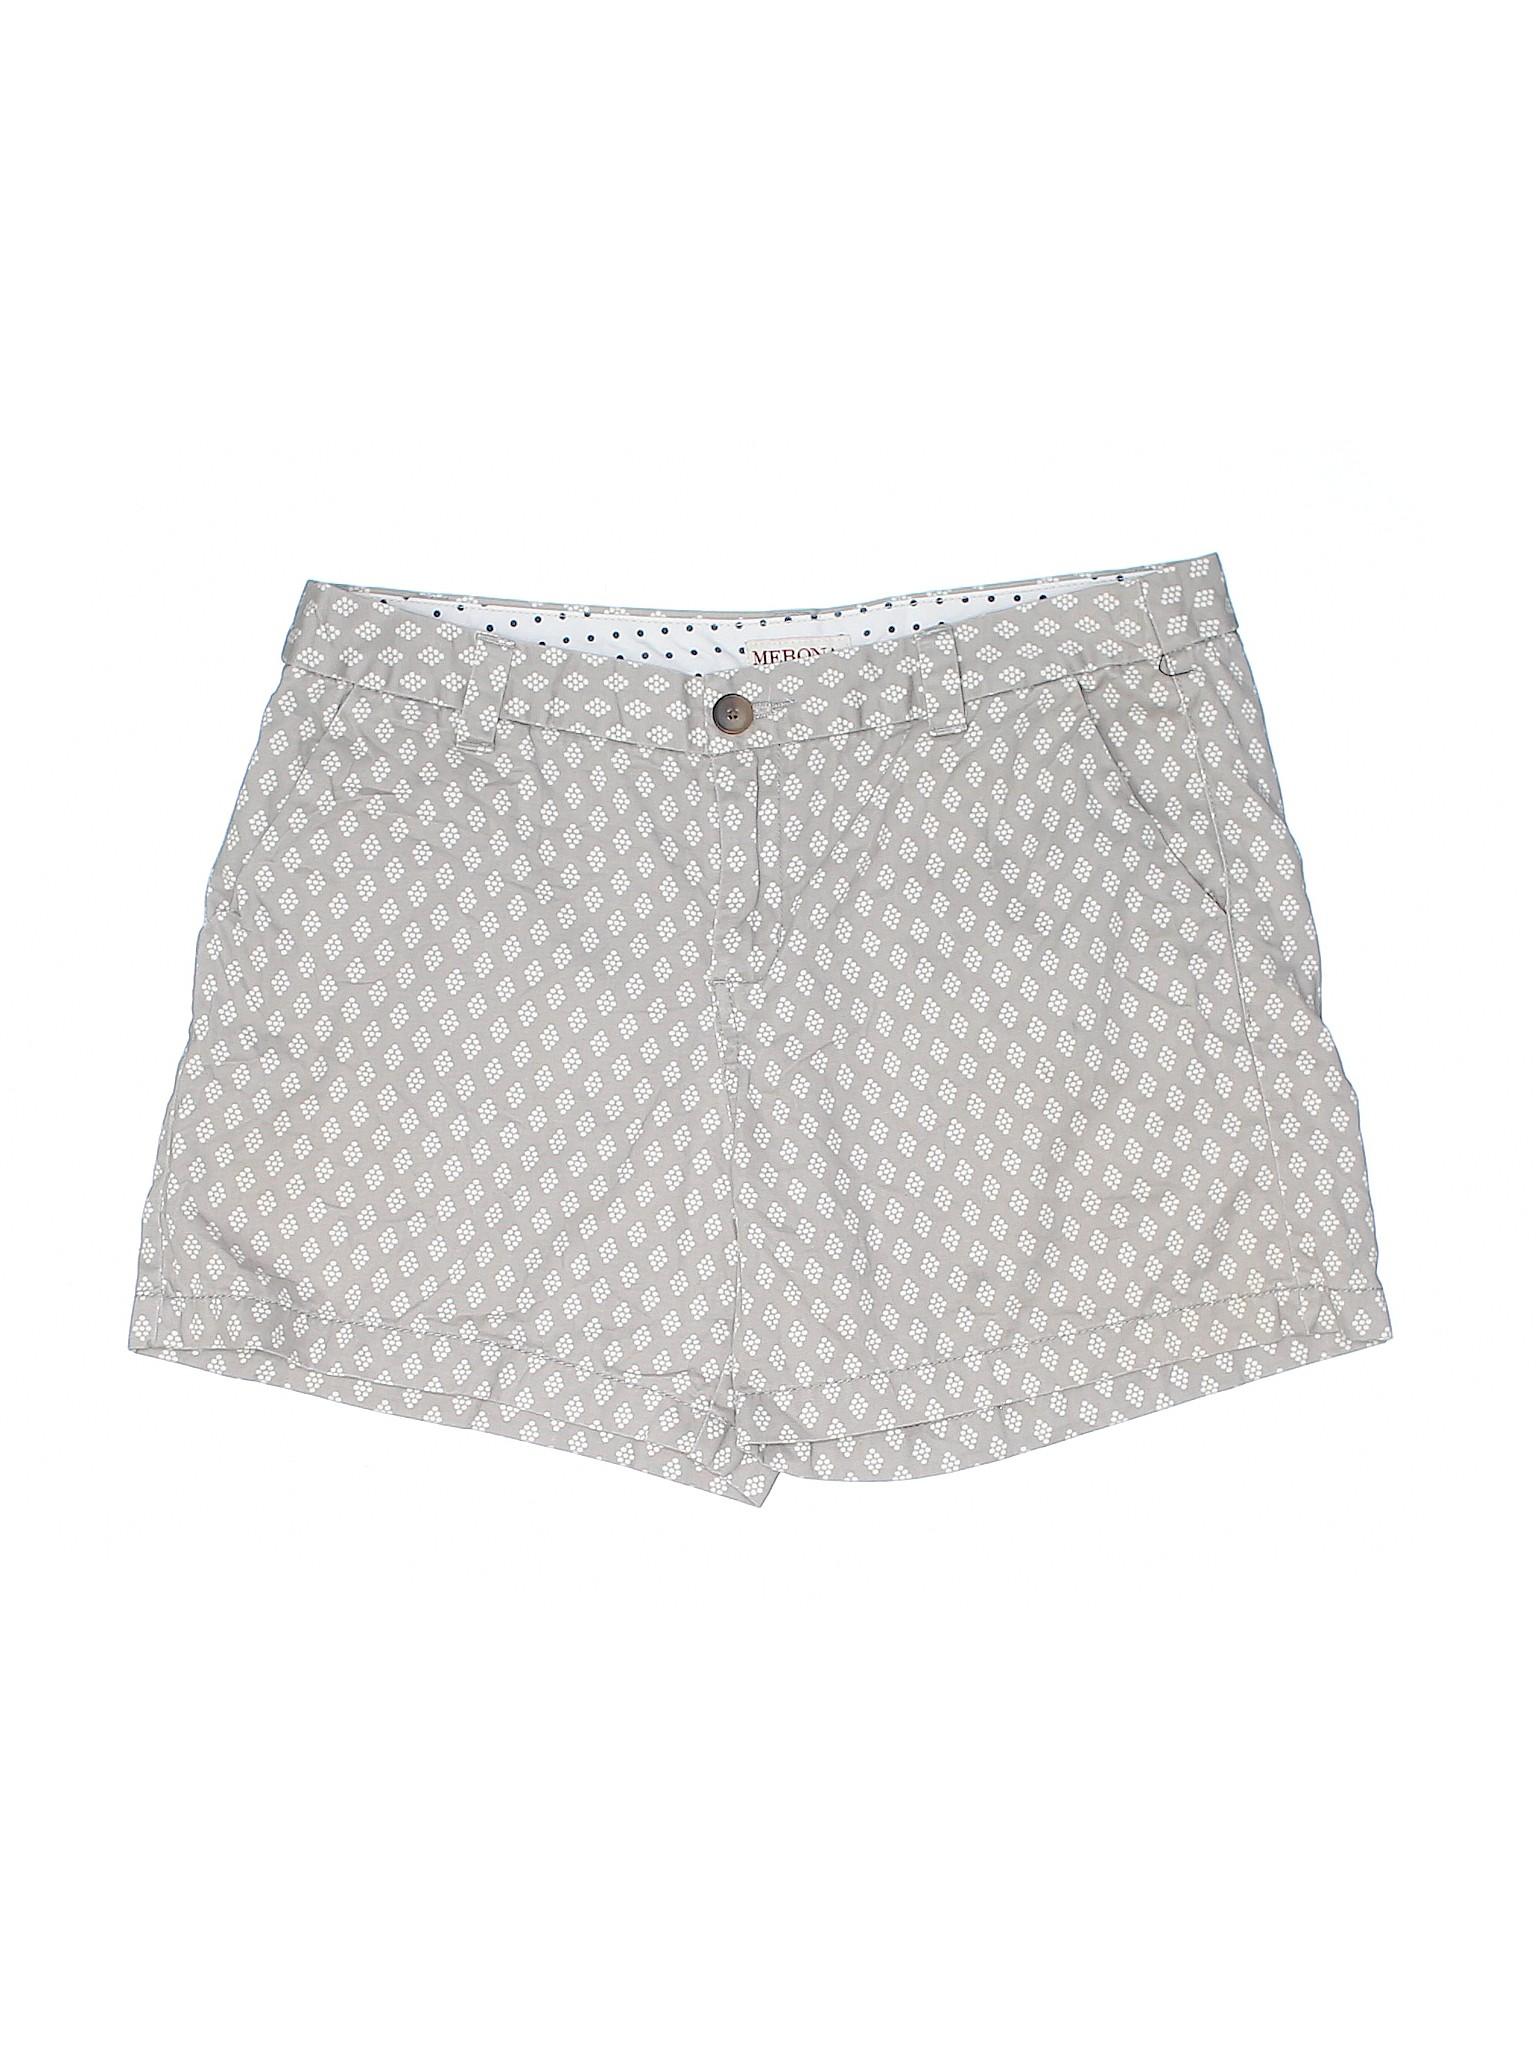 Boutique Khaki Merona Shorts Boutique Khaki Shorts Khaki Merona Shorts Merona Boutique xIEwqdfZw